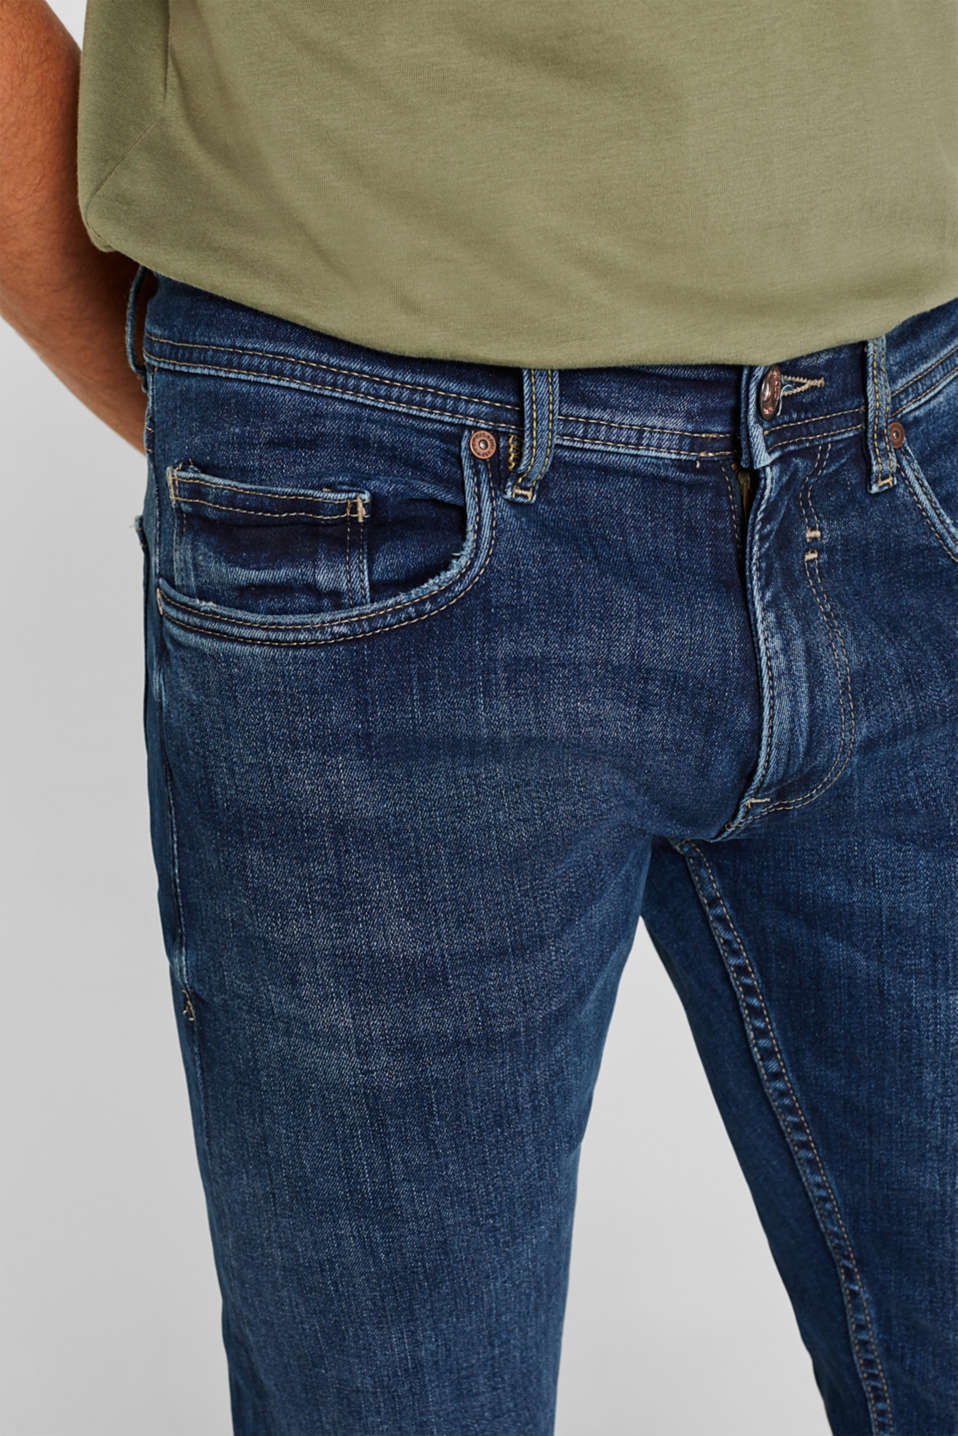 Pants denim Straight fit, BLUE MEDIUM WASH, detail image number 5